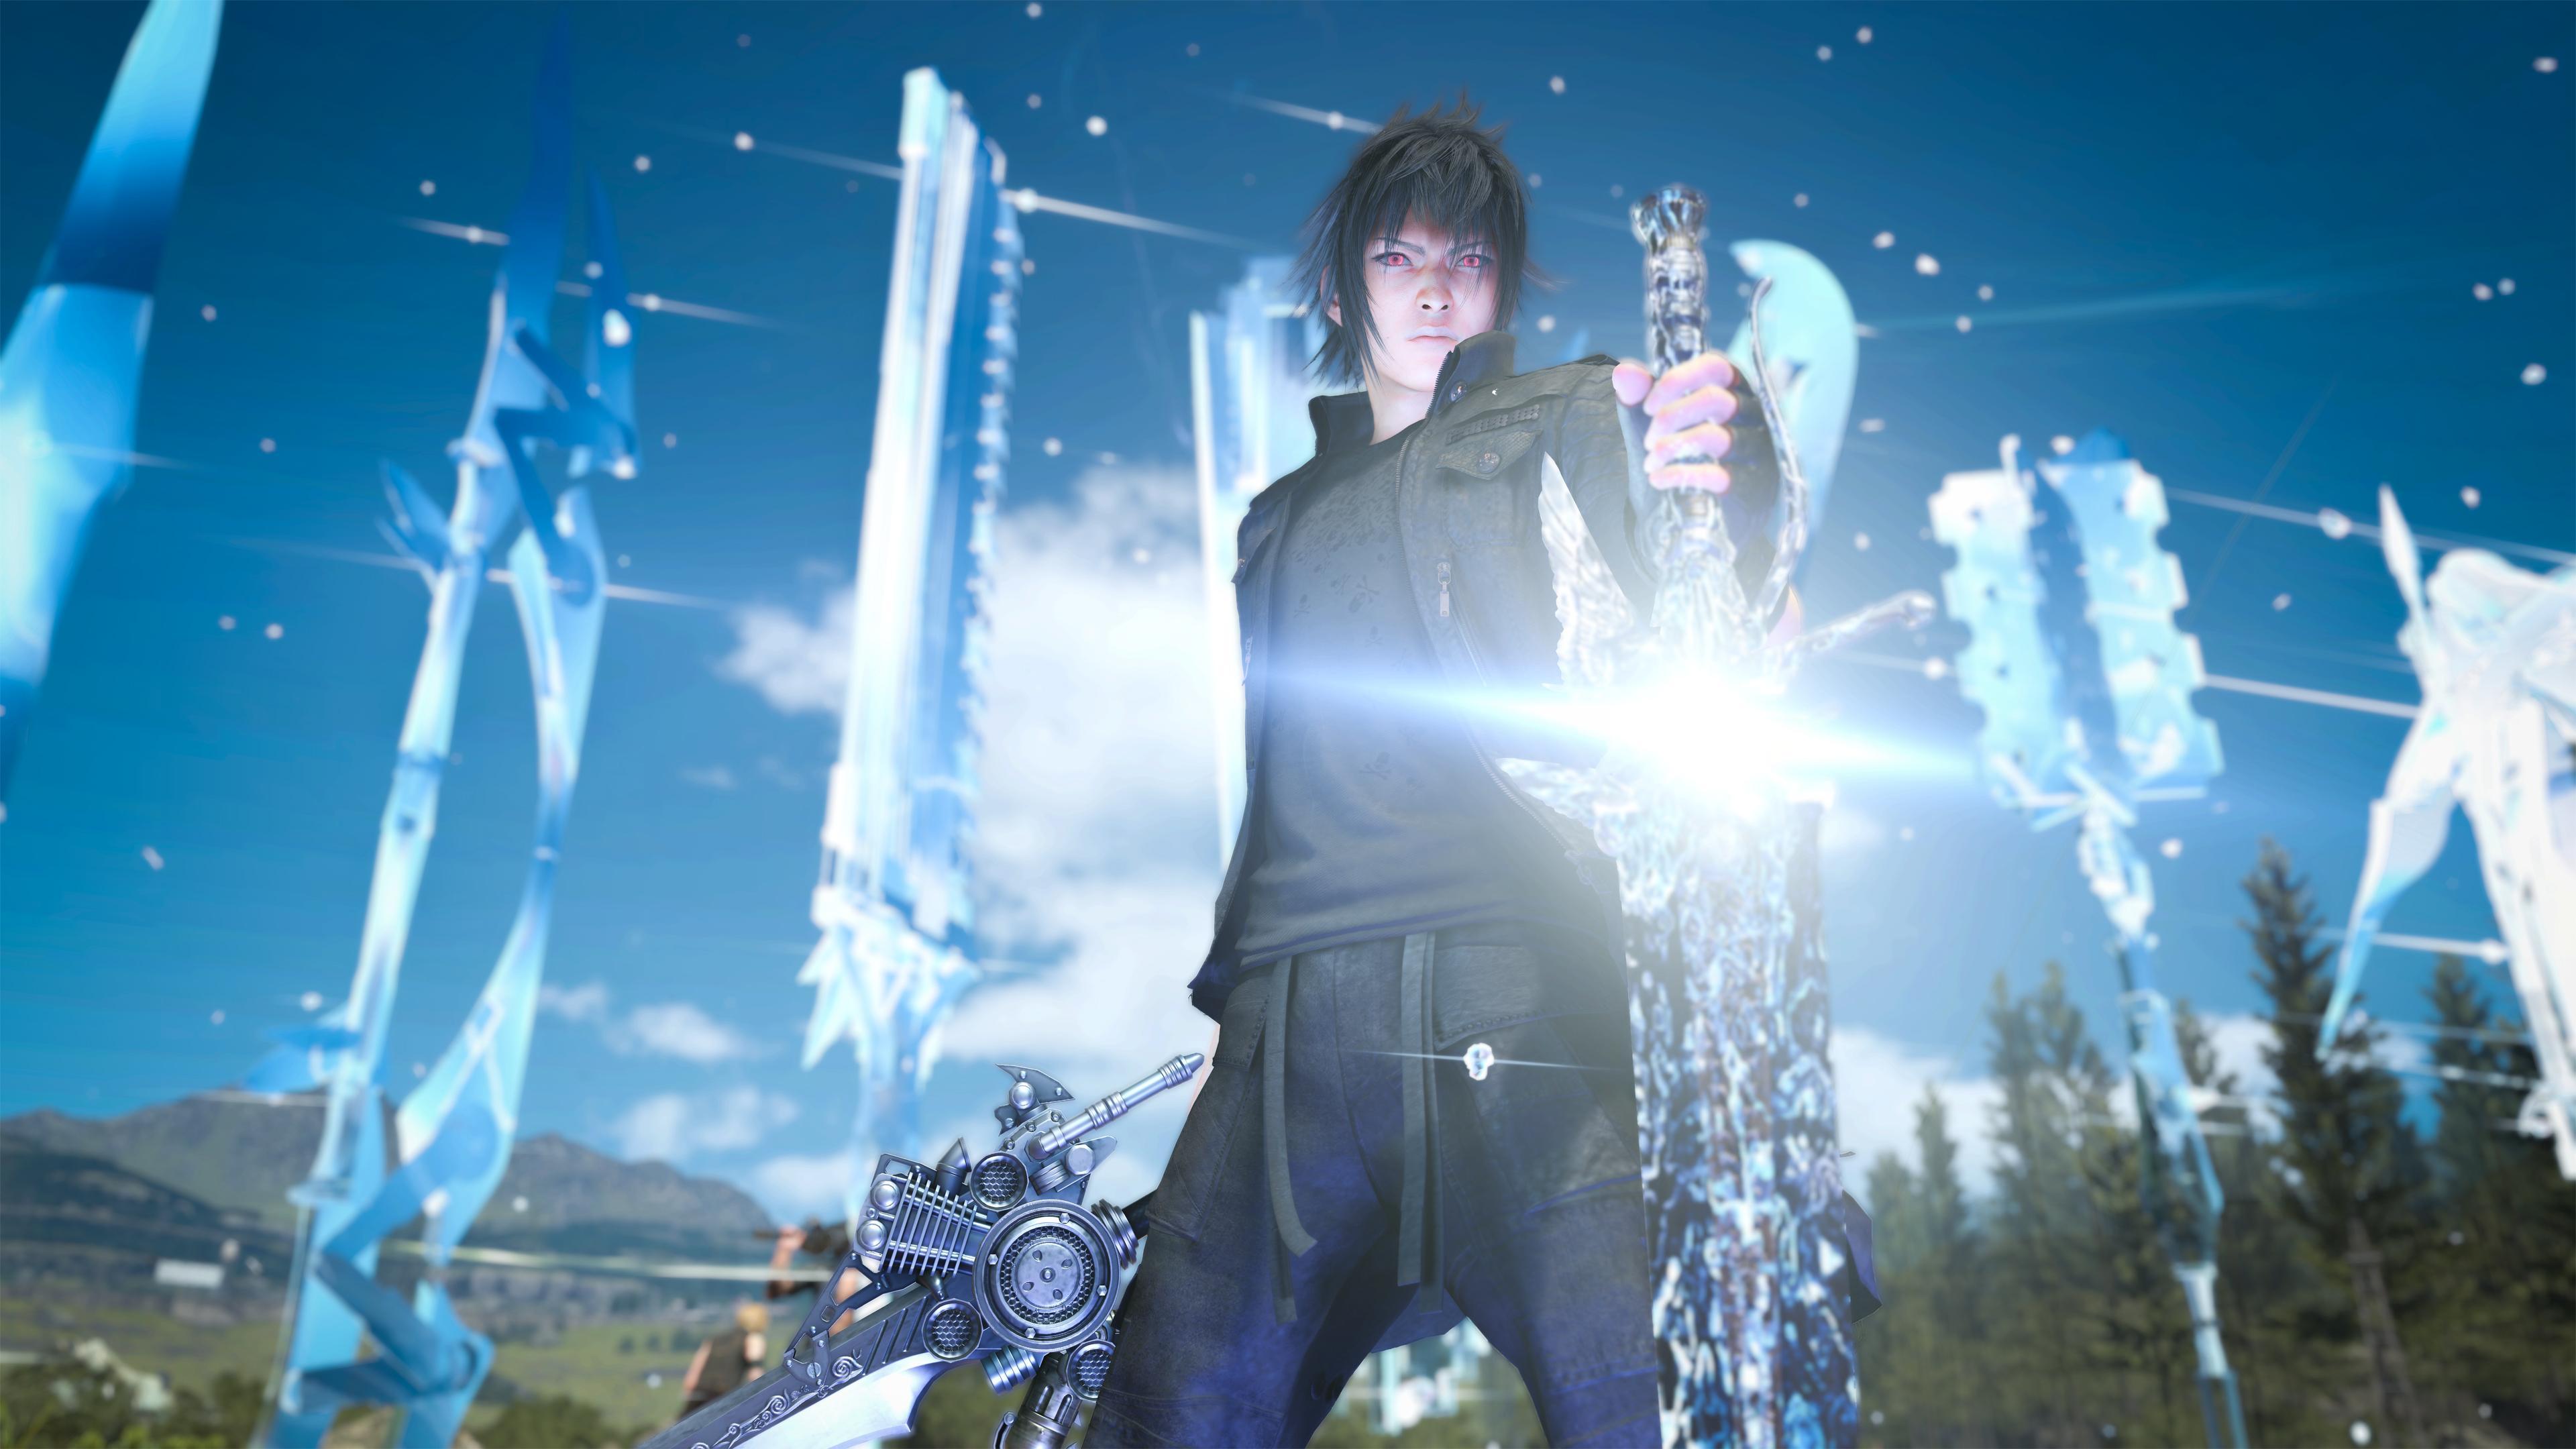 noctis looks pretty cool